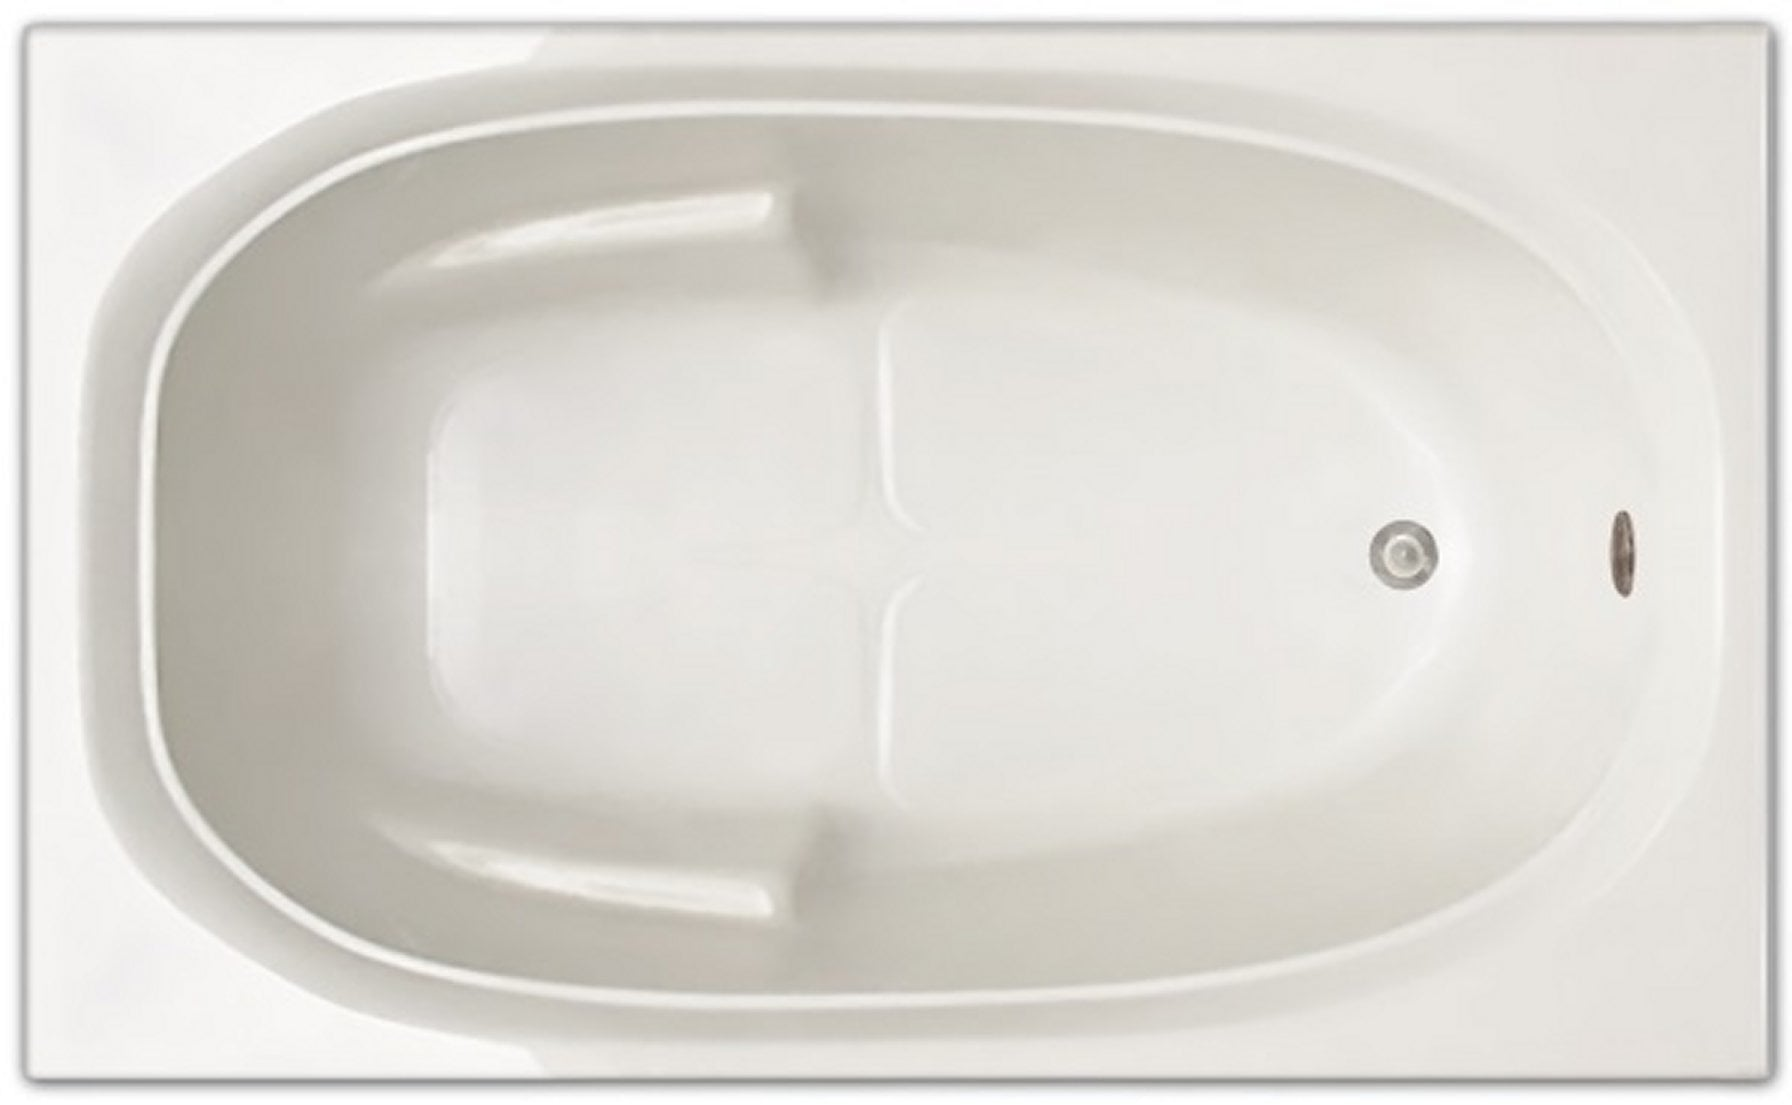 Drop-in Bathtub / 60x36x19 / high gloss white acrylic / Rectangle / LPI221-S Pinnacle Bath - Soaker 0